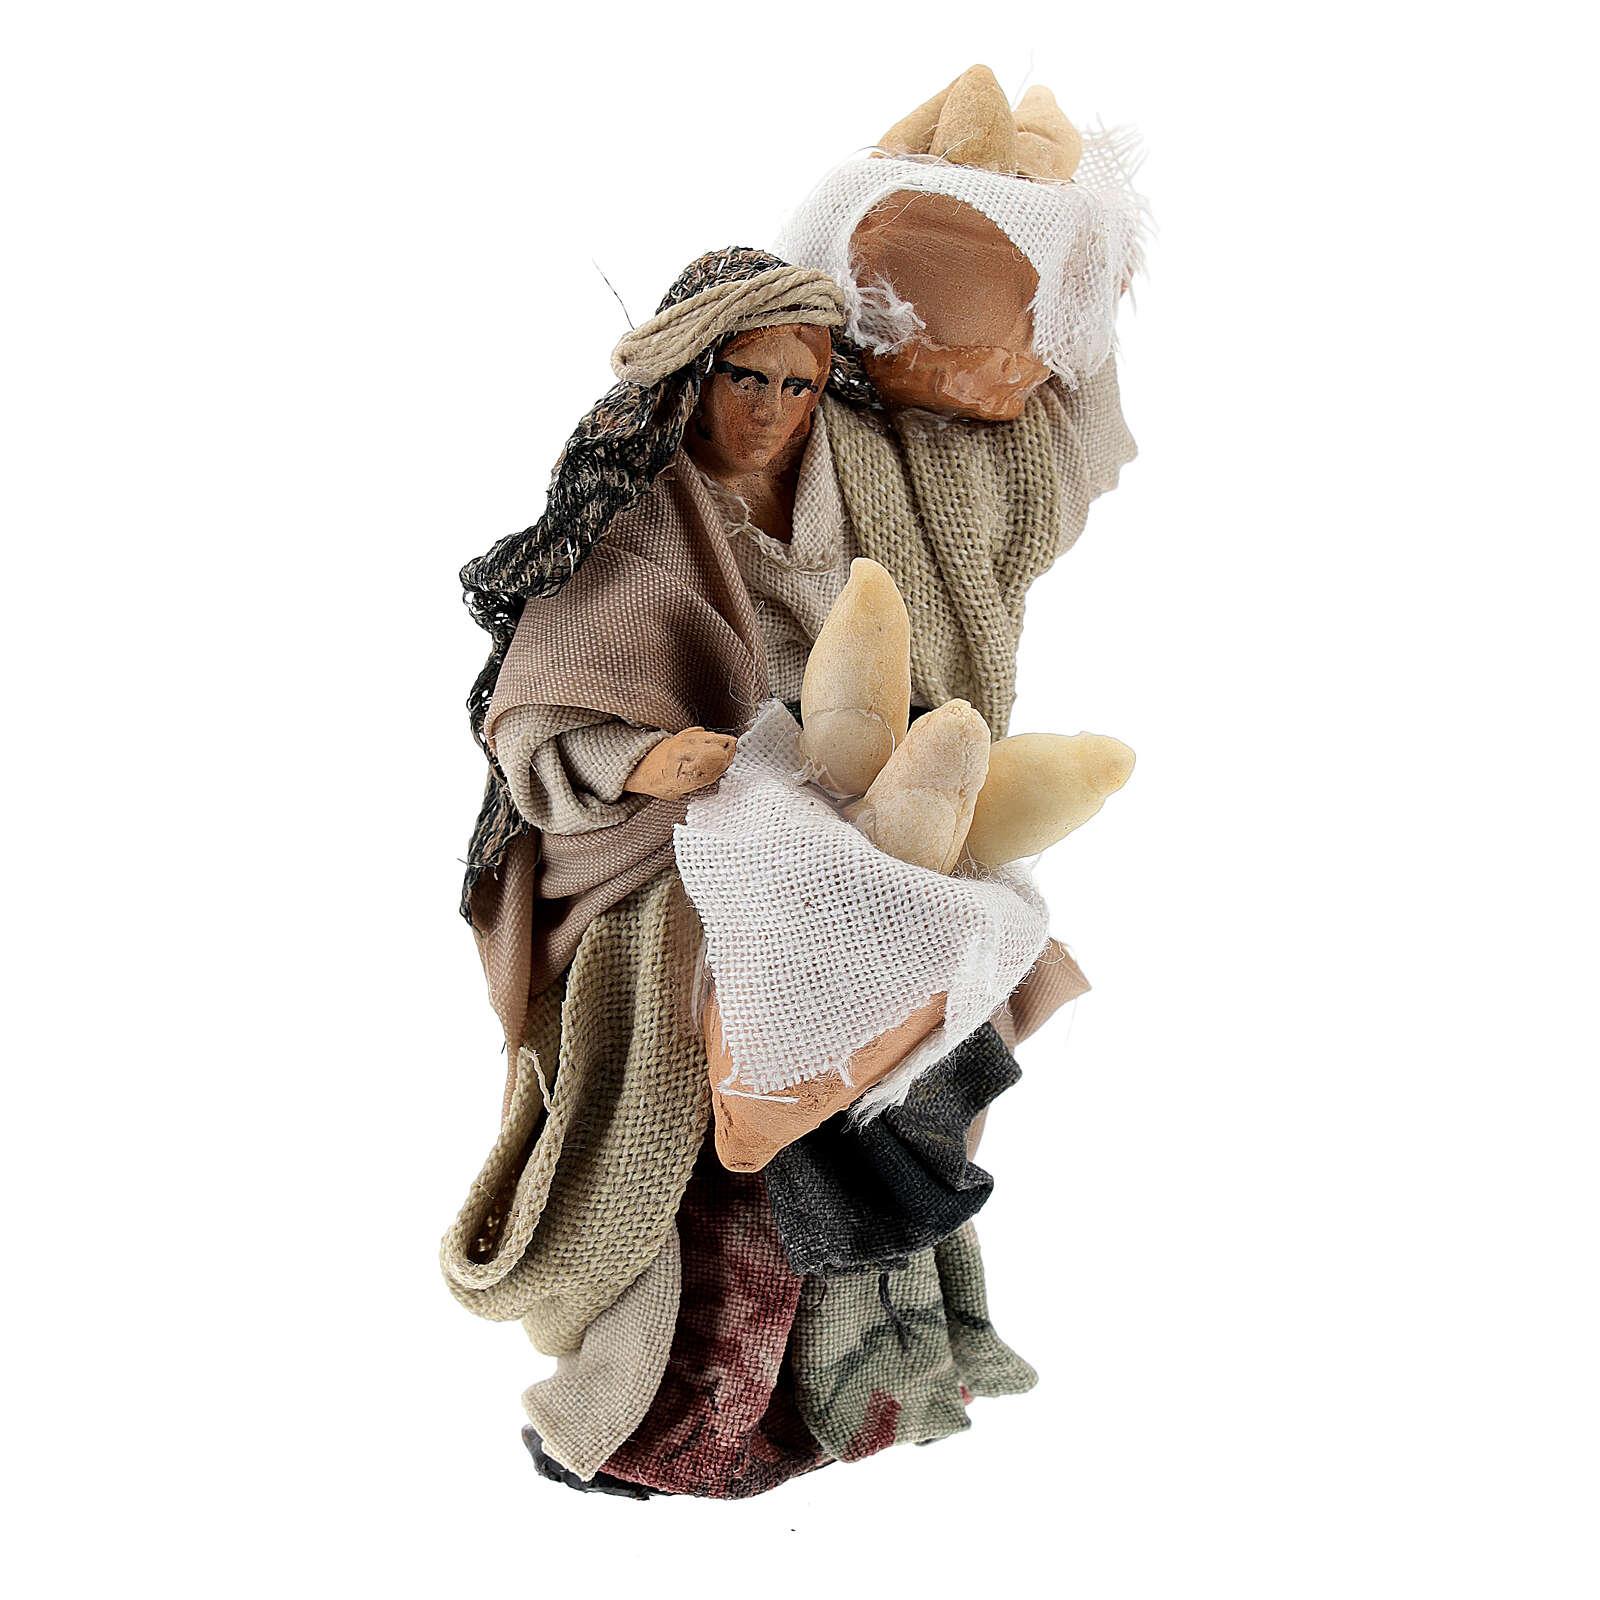 Woman with bread baskets, 8 cm Neapolitan nativity figurine 4